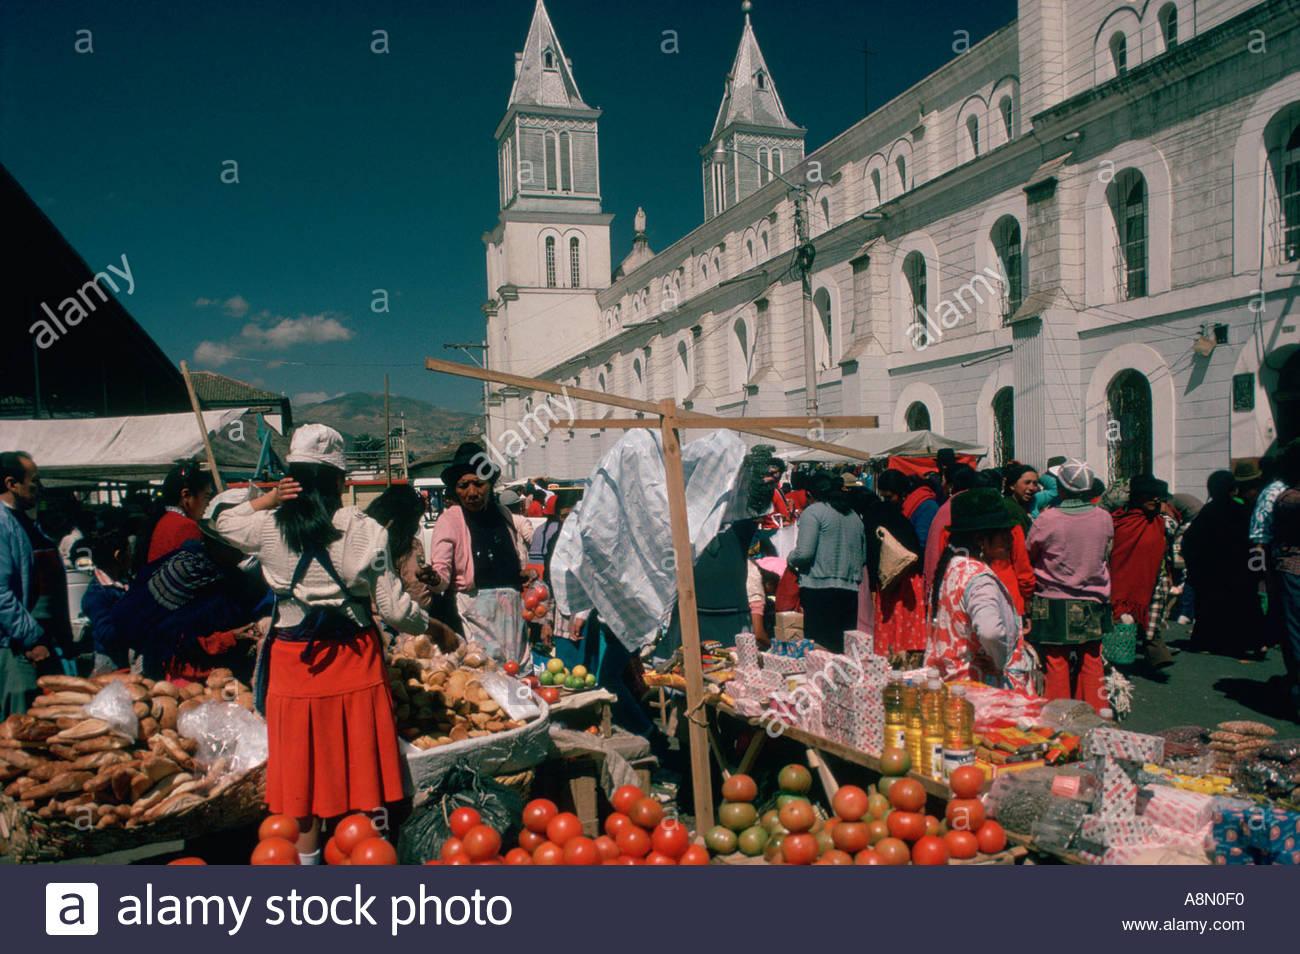 ECUADOR Andes Chimborazo province Riobamba city market Stock